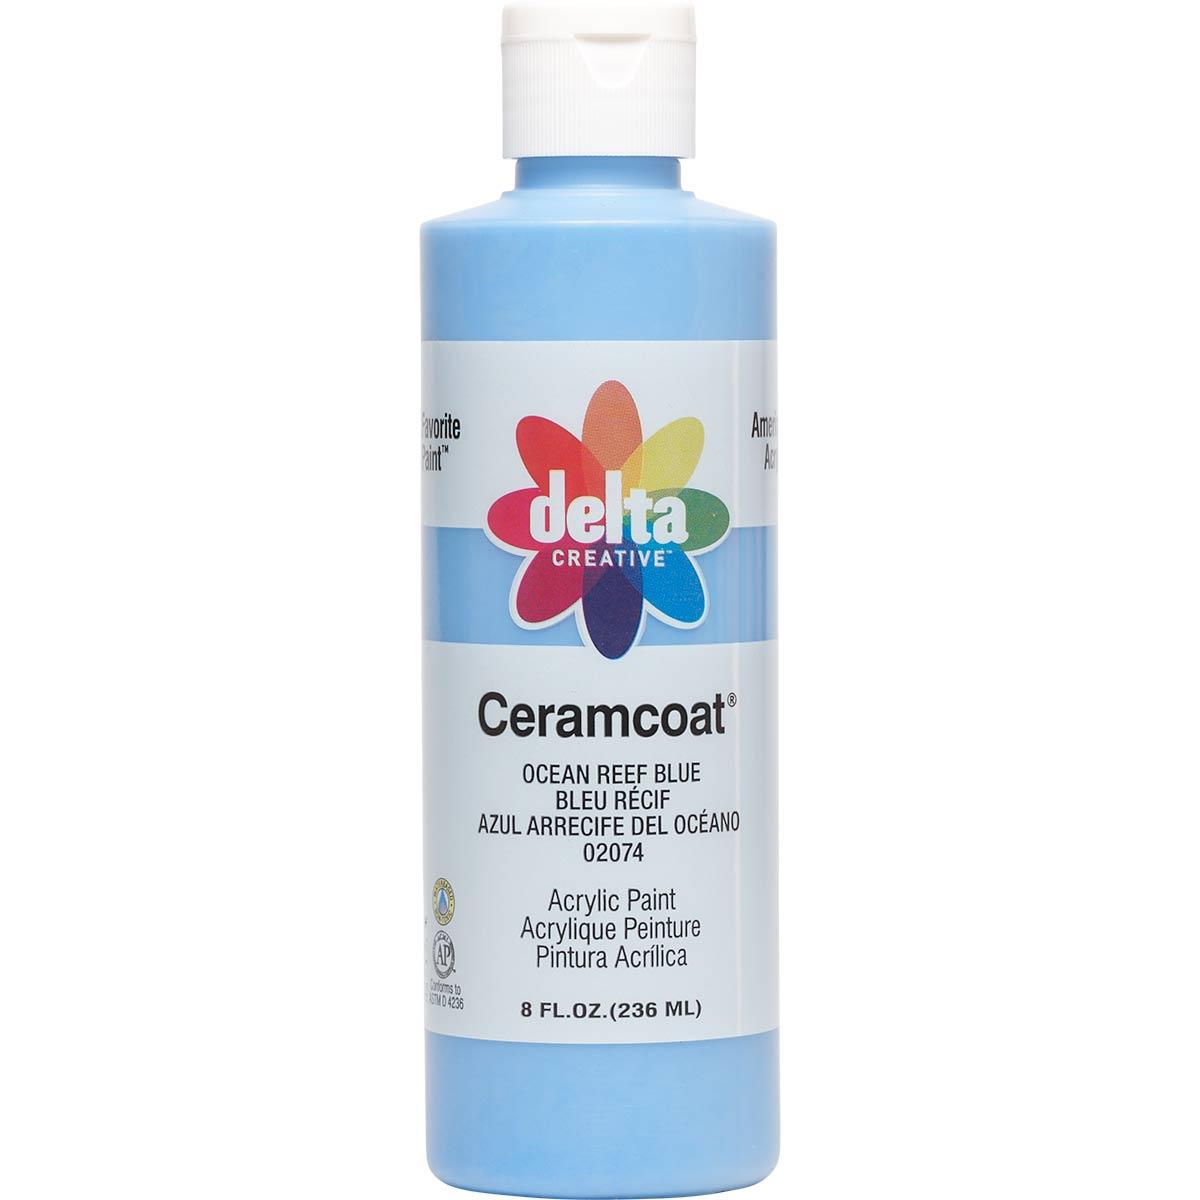 Delta Ceramcoat ® Acrylic Paint - Ocean Reef Blue, 8 oz.